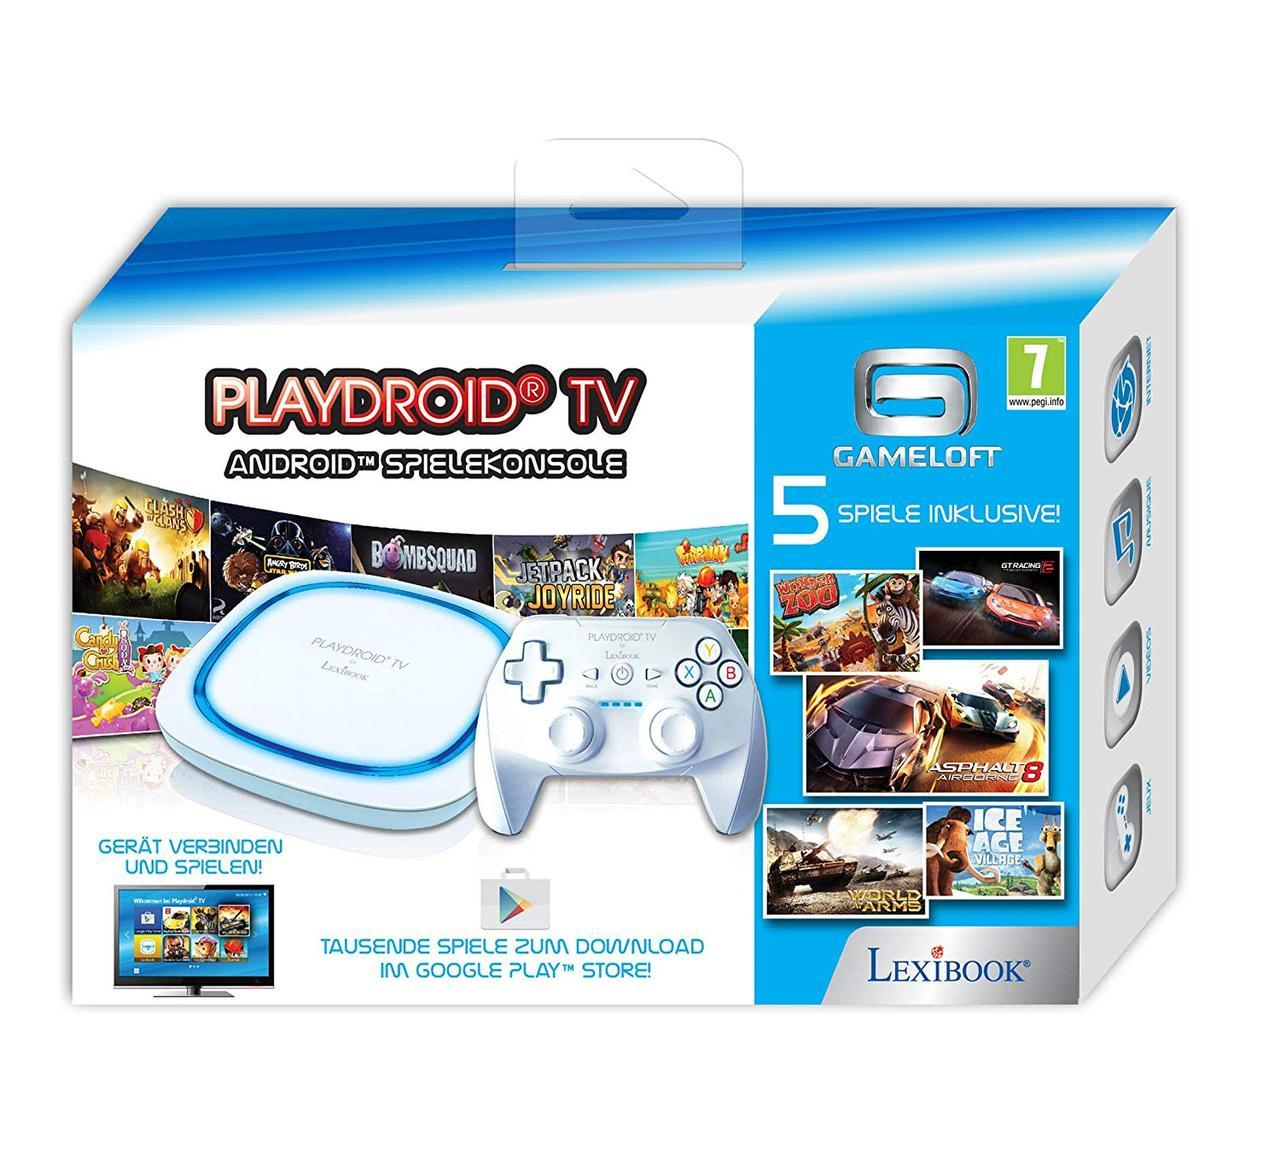 Ігрова консоль Lexibook playdroid TV